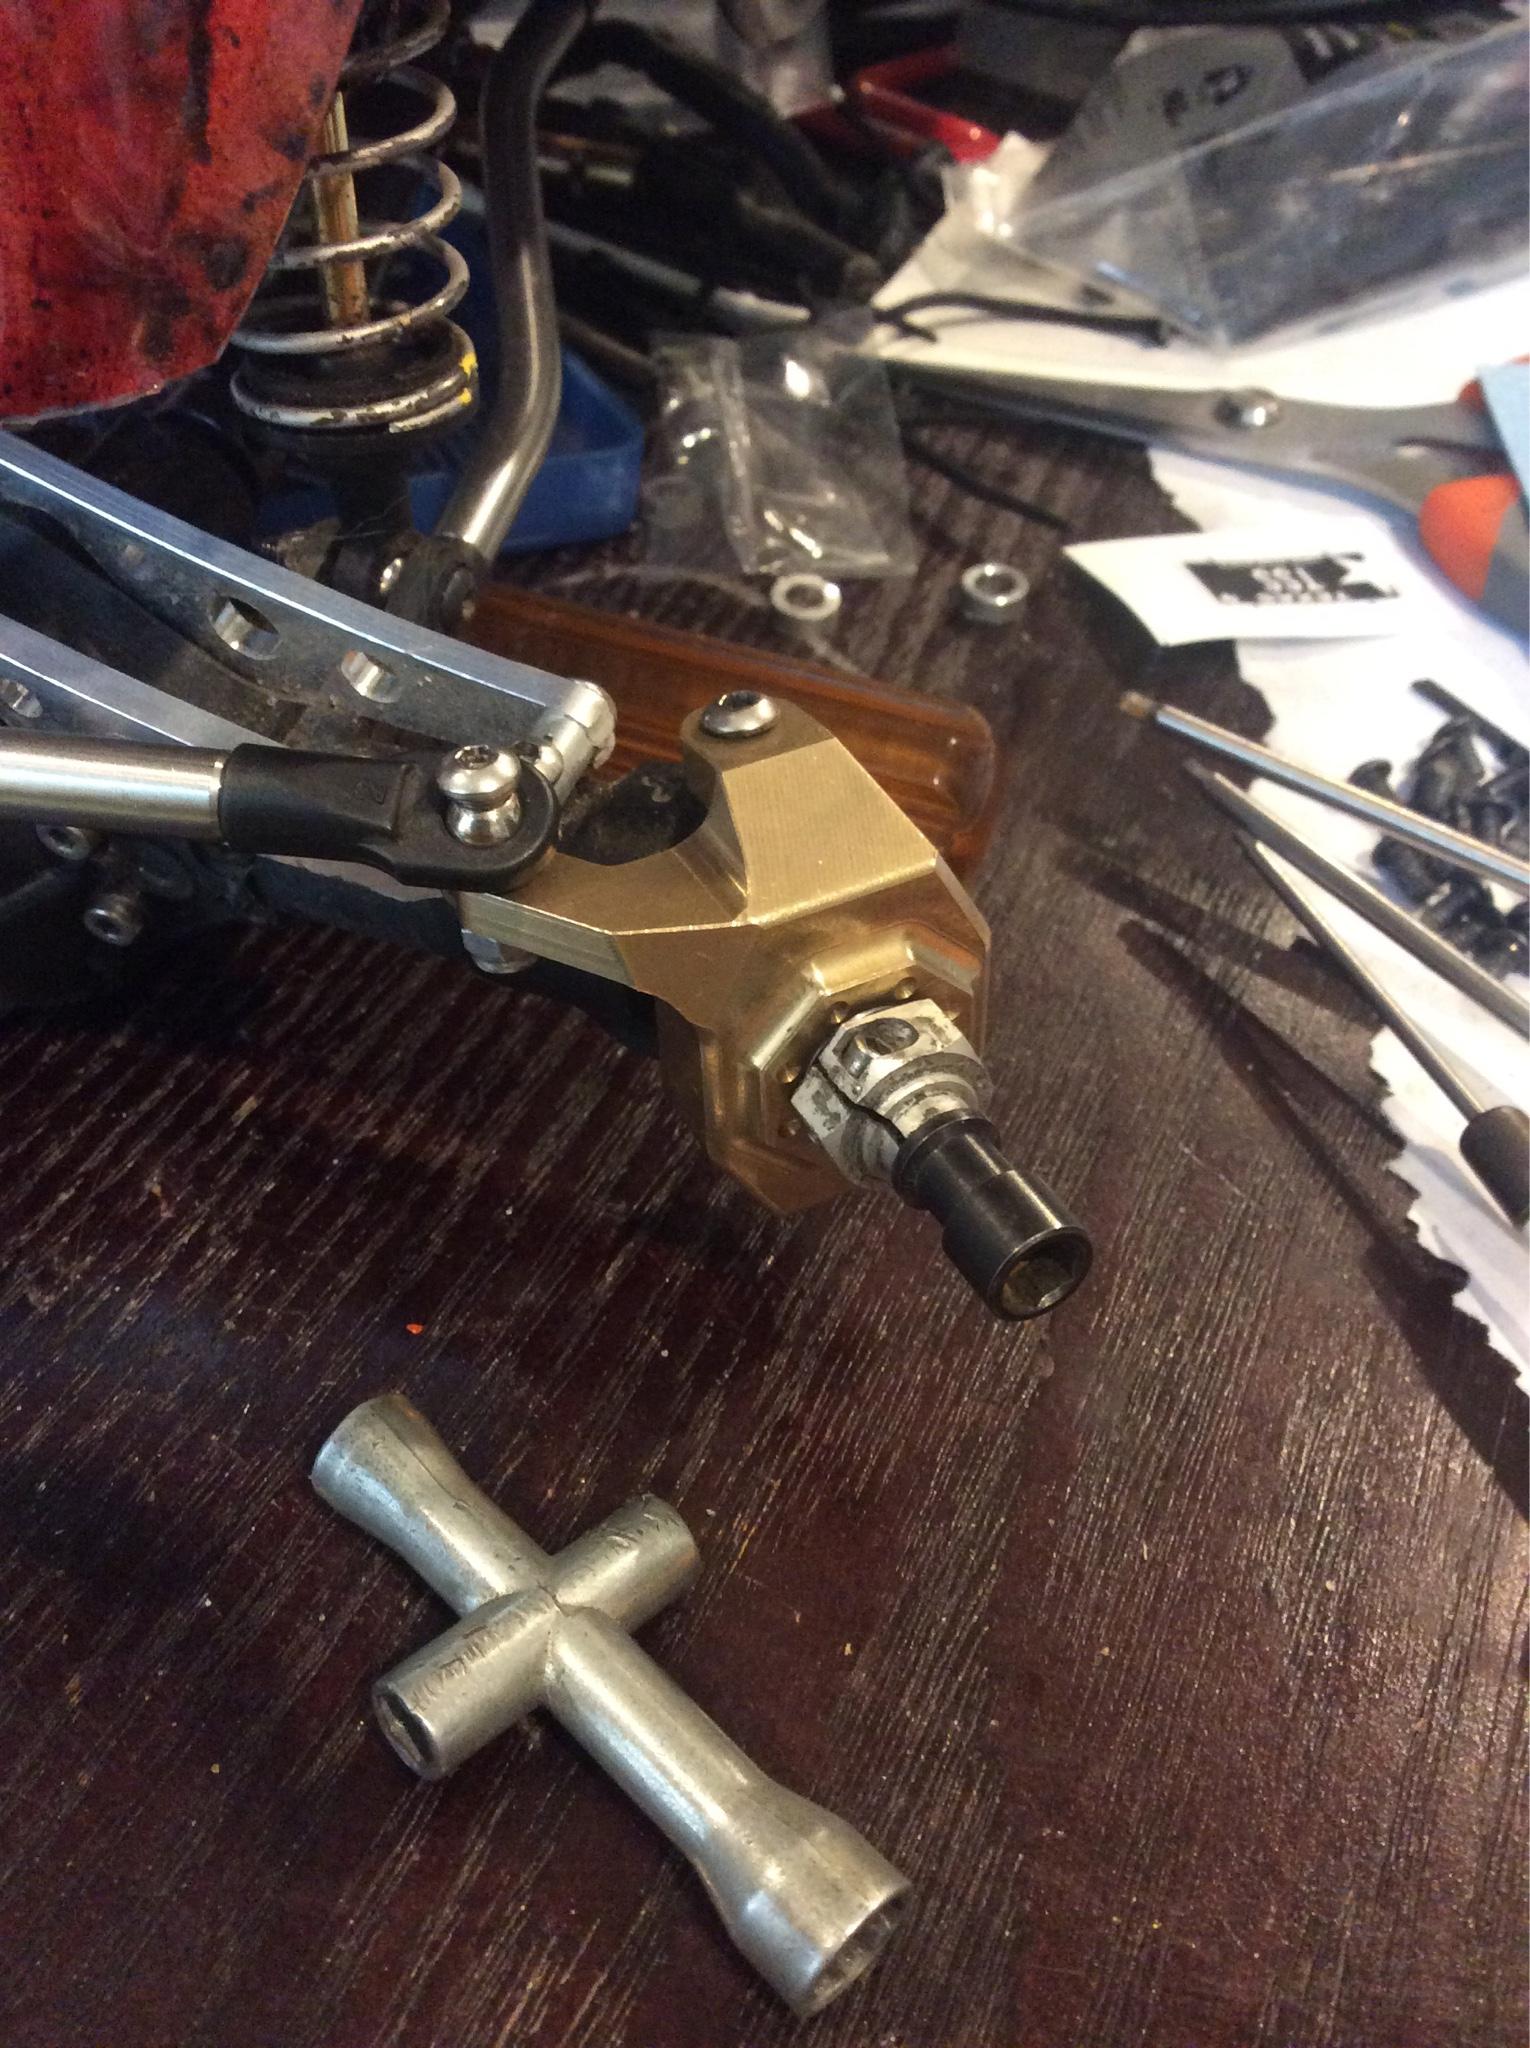 010068a2eaa19b1b60f1eb52c2e950d0 TSS ar60 brass knuckles